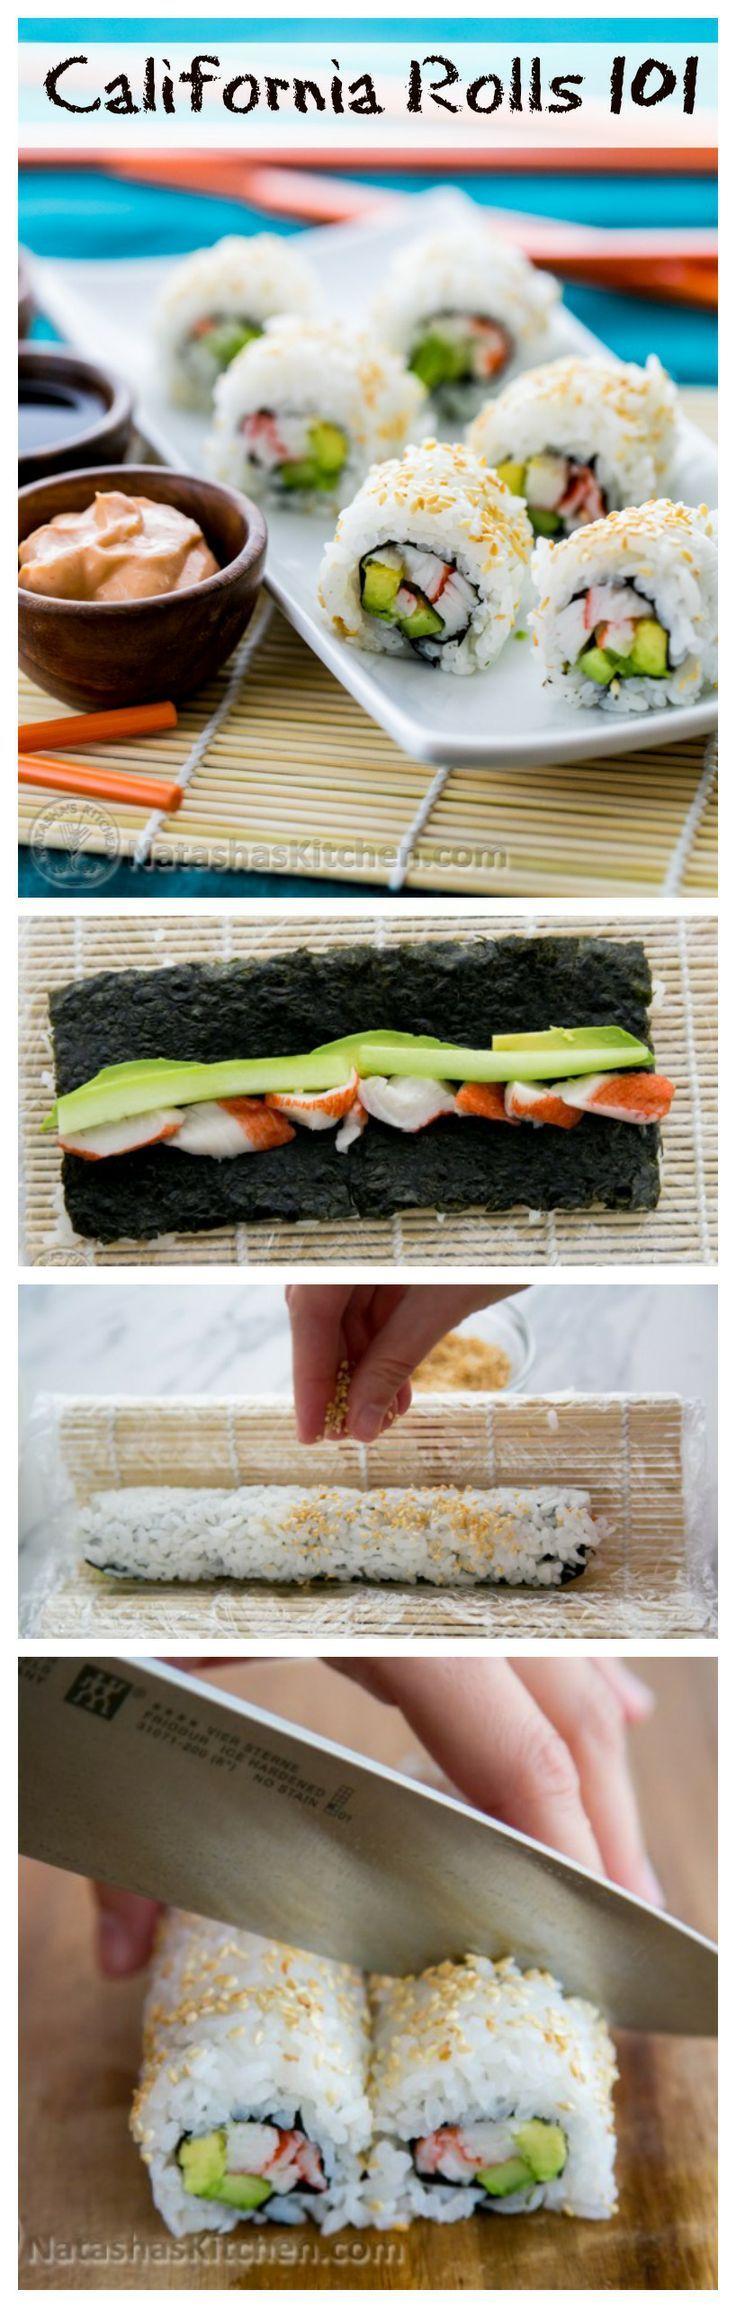 Sushi Rice and California Rolls